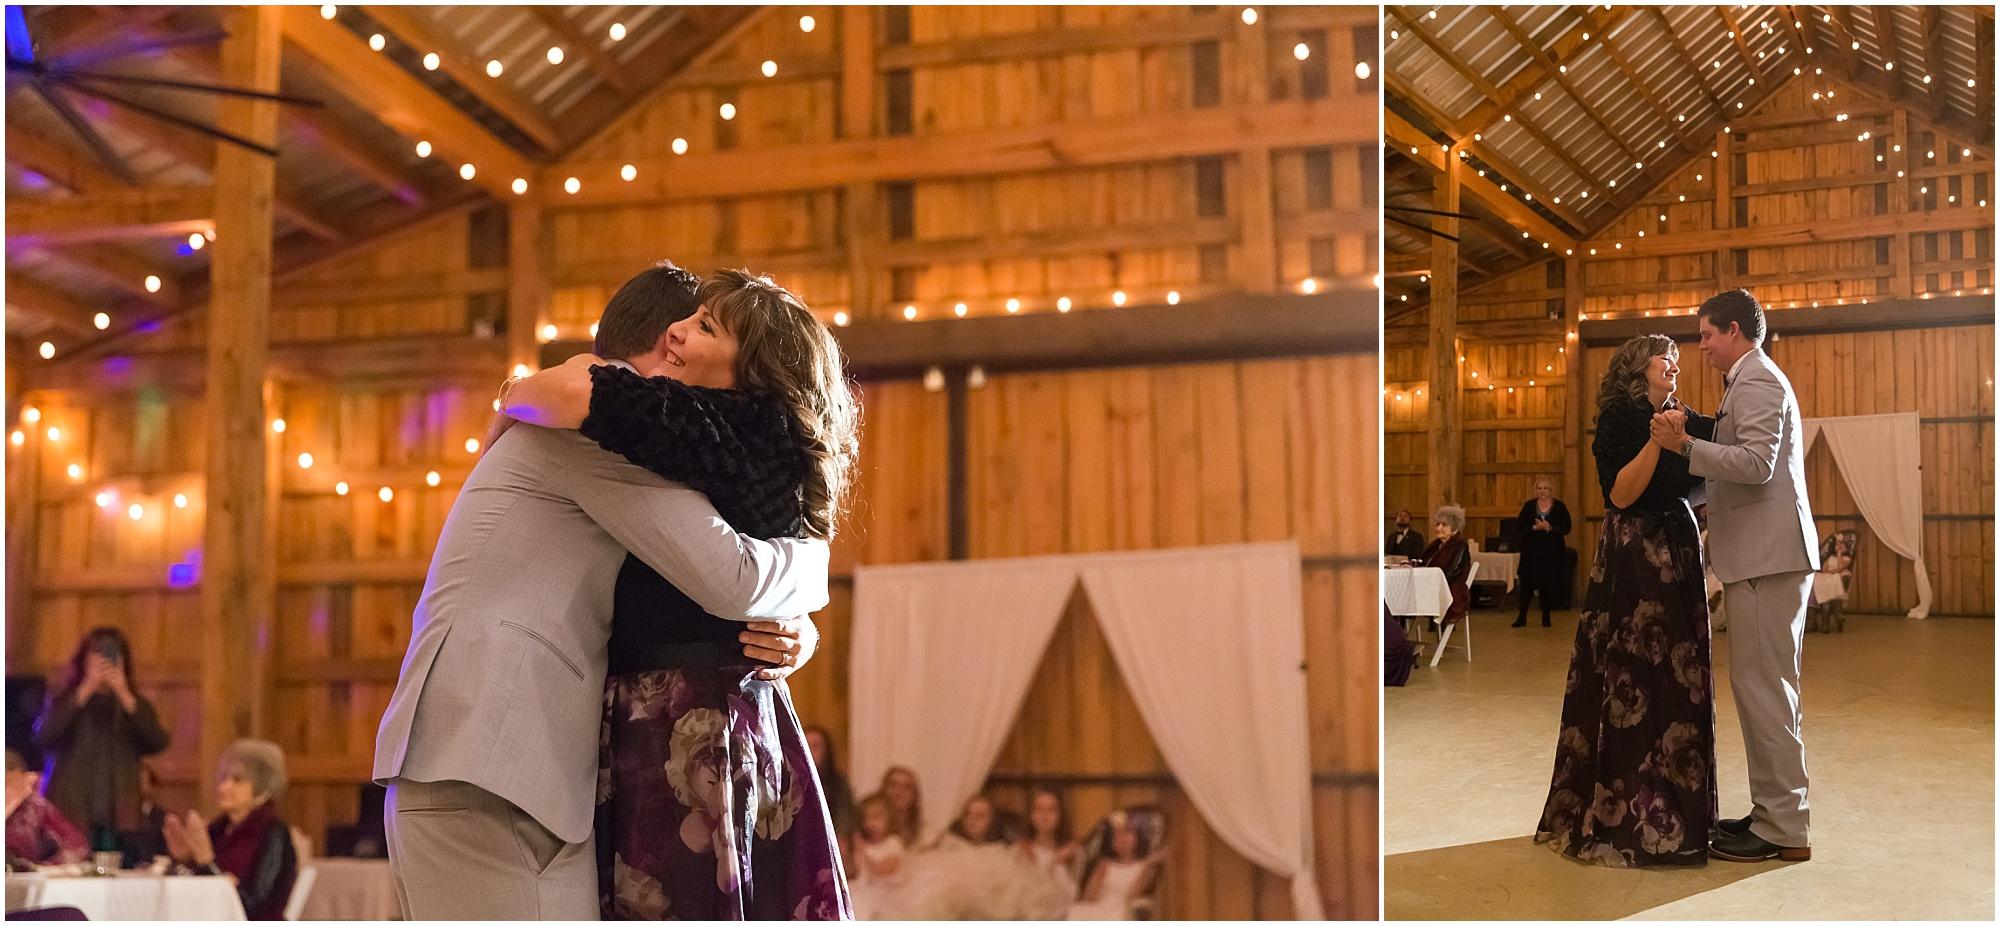 Disney-Inspired-Wedding-Central-Texas_0060.jpg